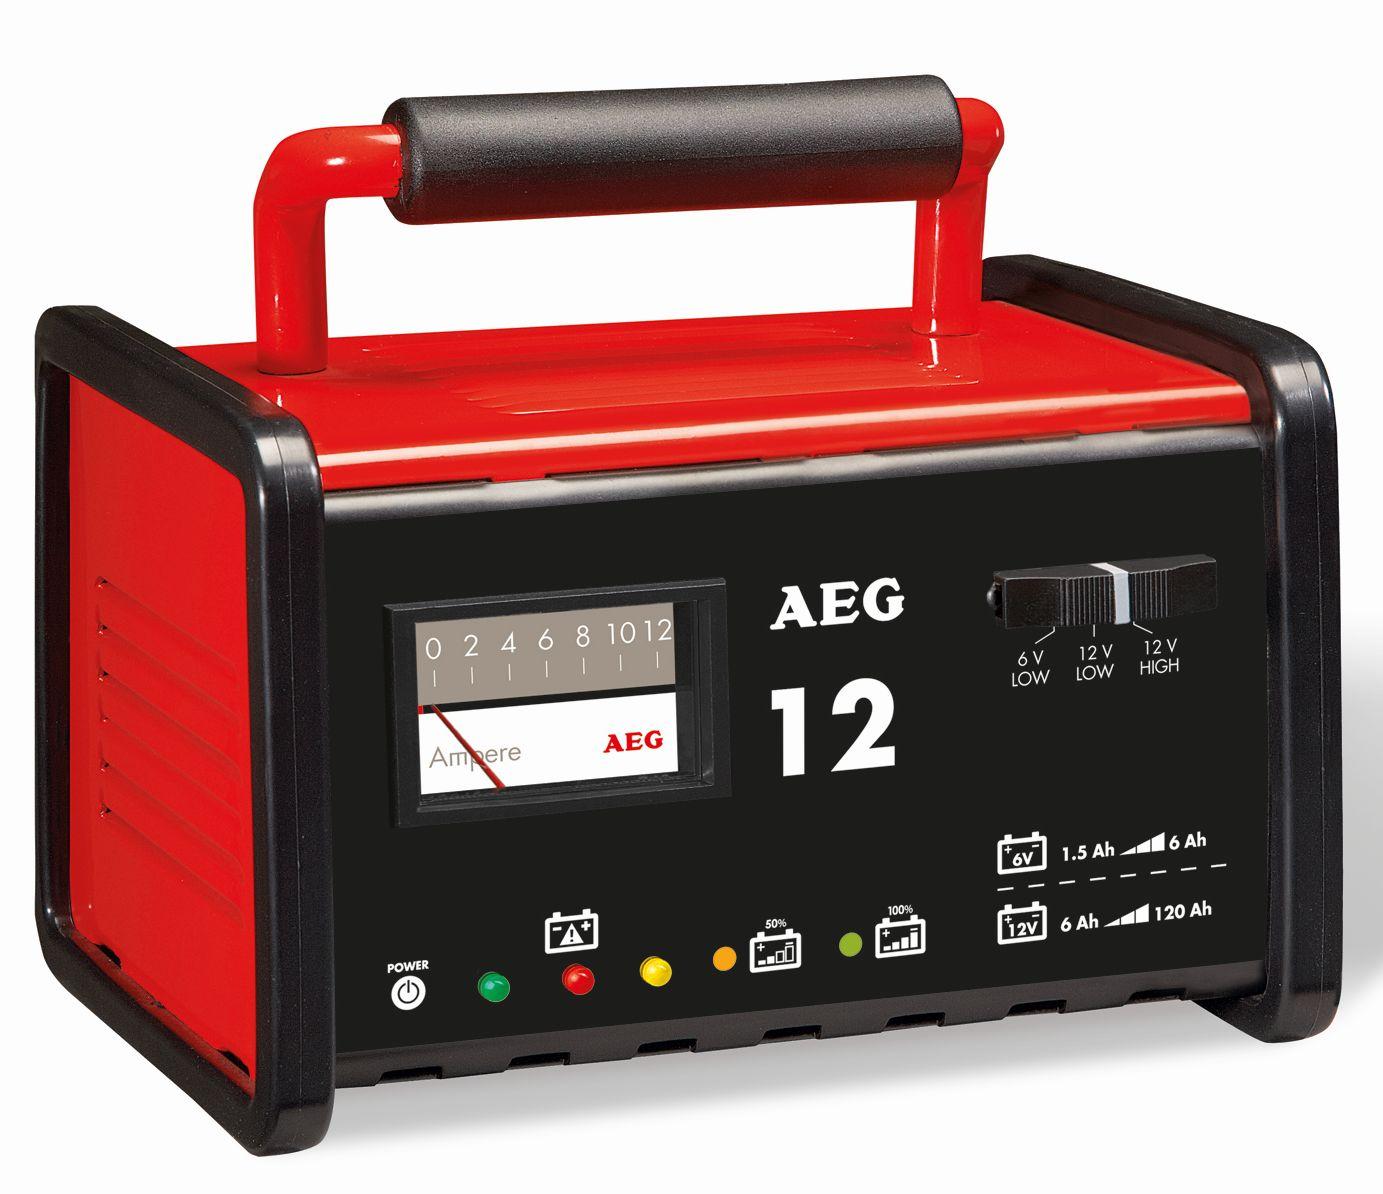 AEG Nabíječka autobaterií kovová 12A 6 - 12V 1,5 - 120Ah